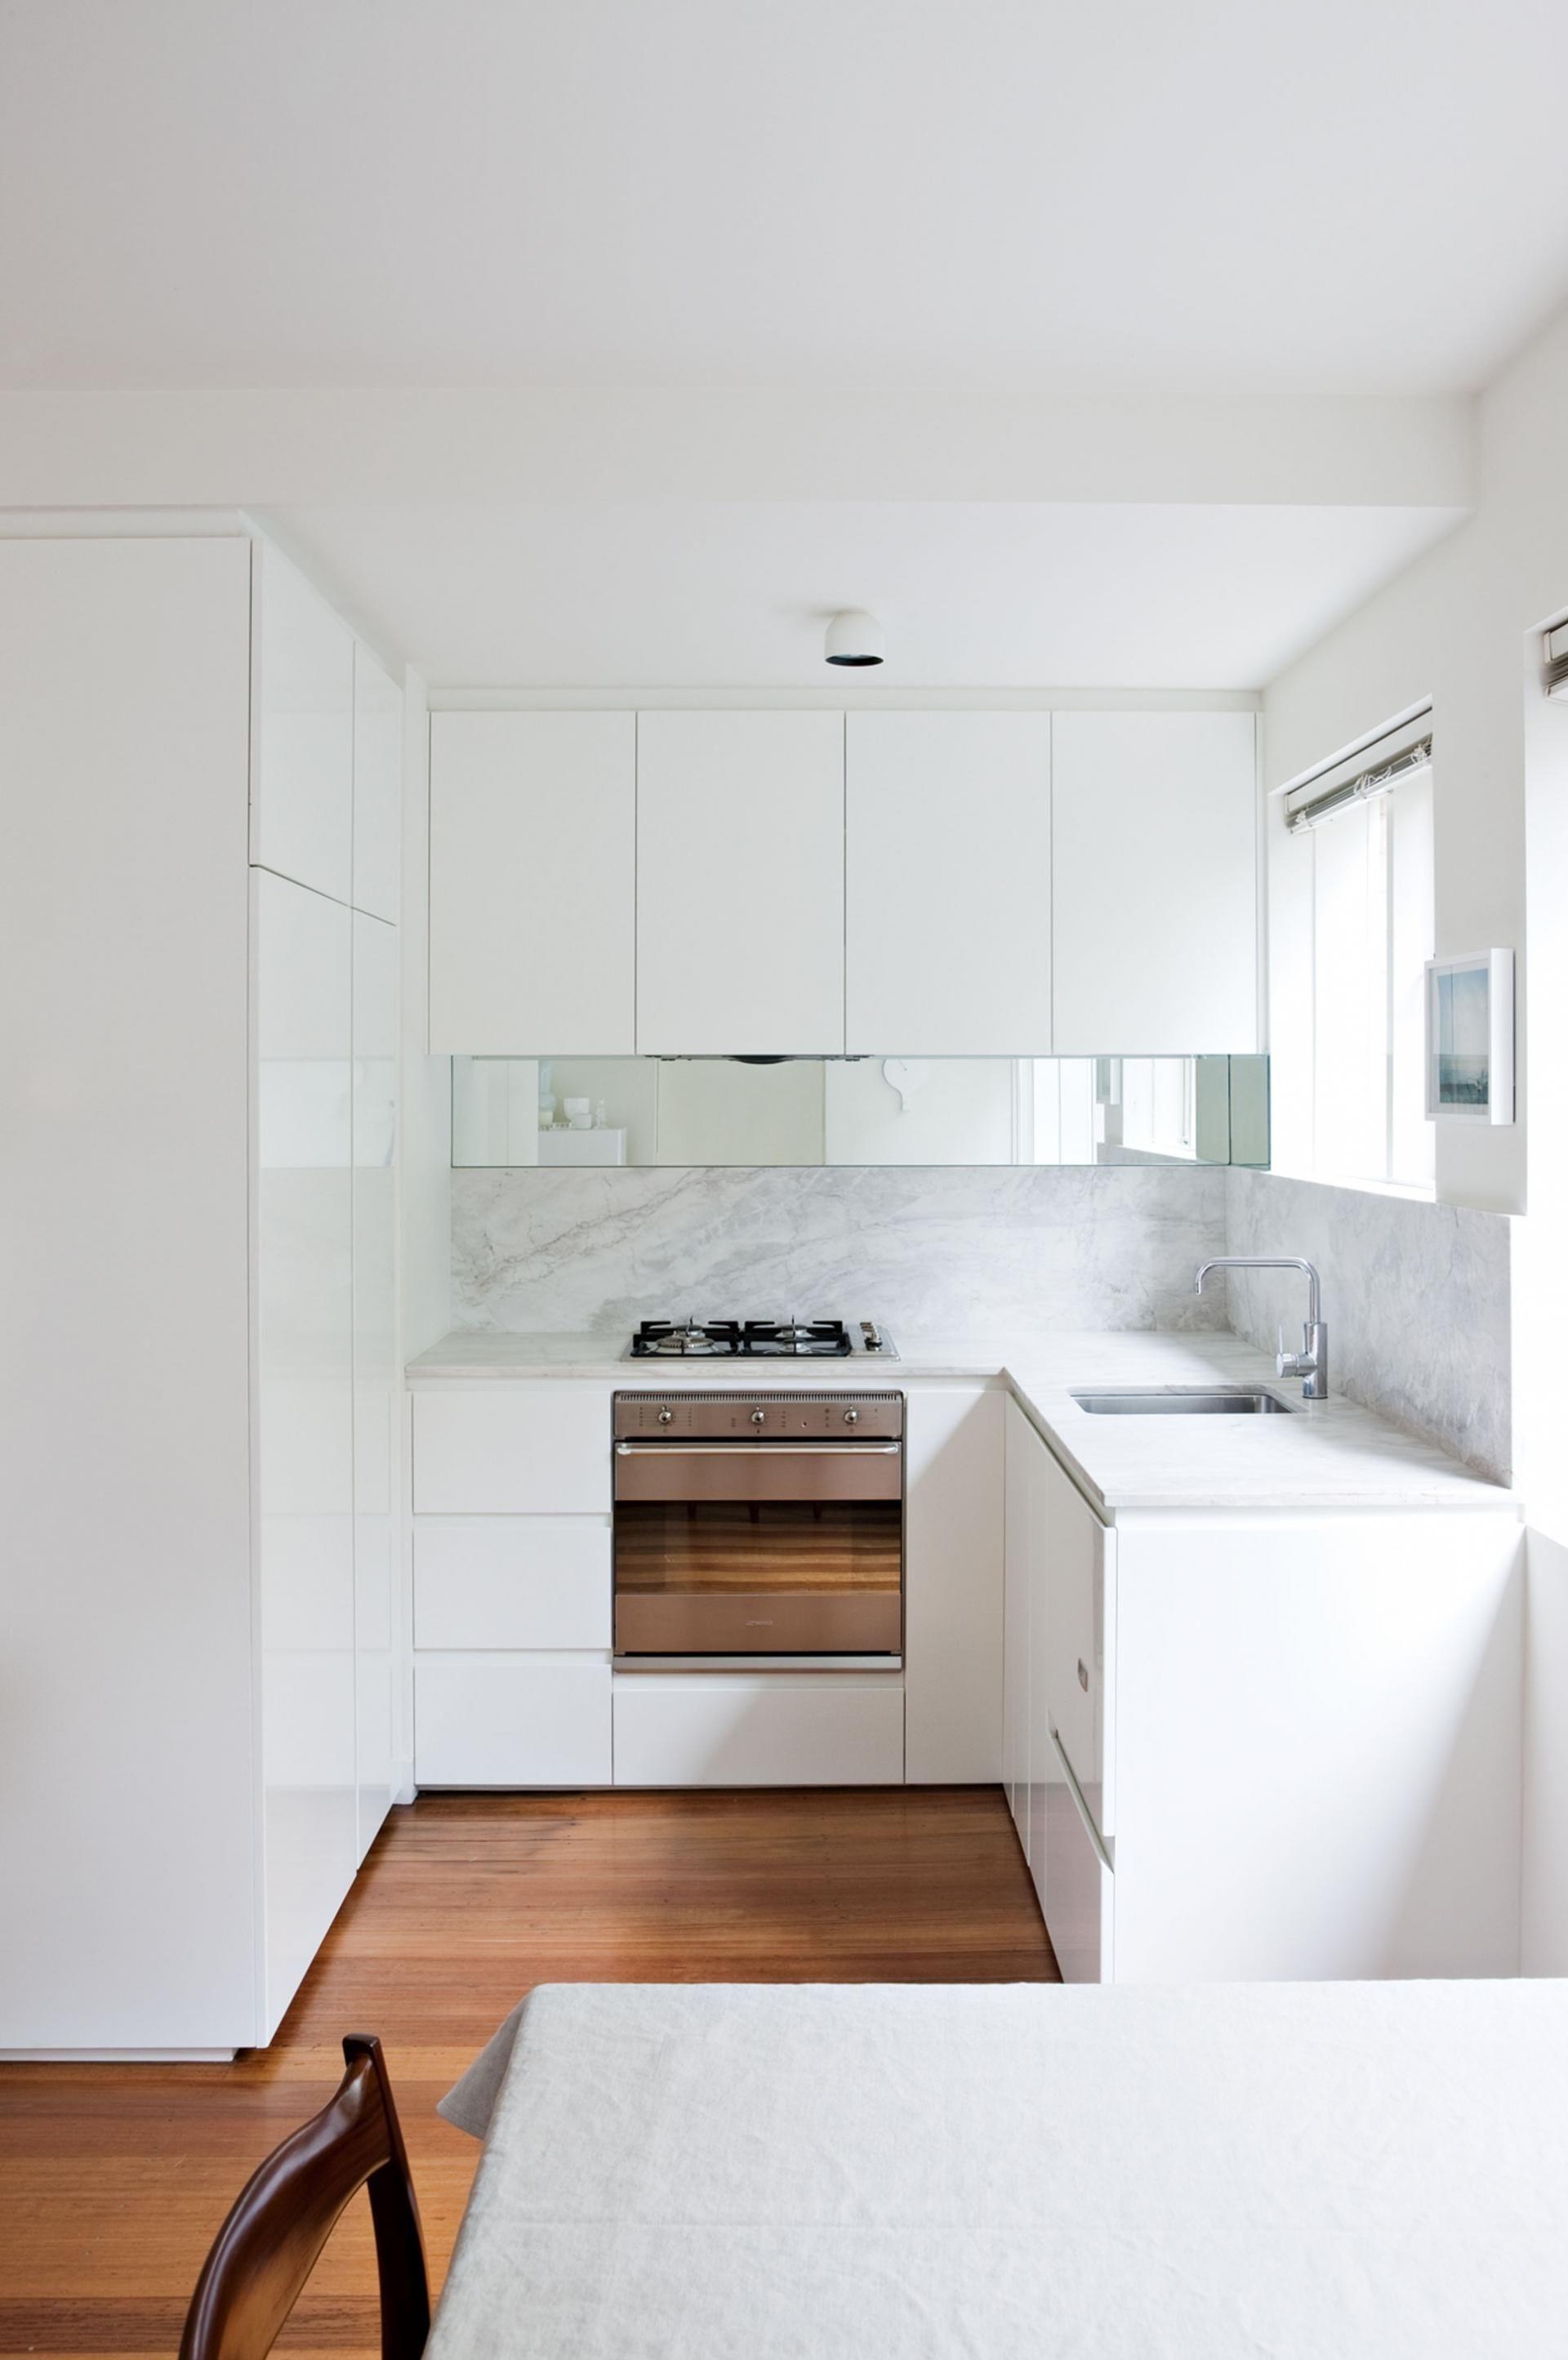 personalize-of-diy-kitchen-windows-kitchen-small-house-kitchen-of-white-kitchen-ideas-for-small-kitchens